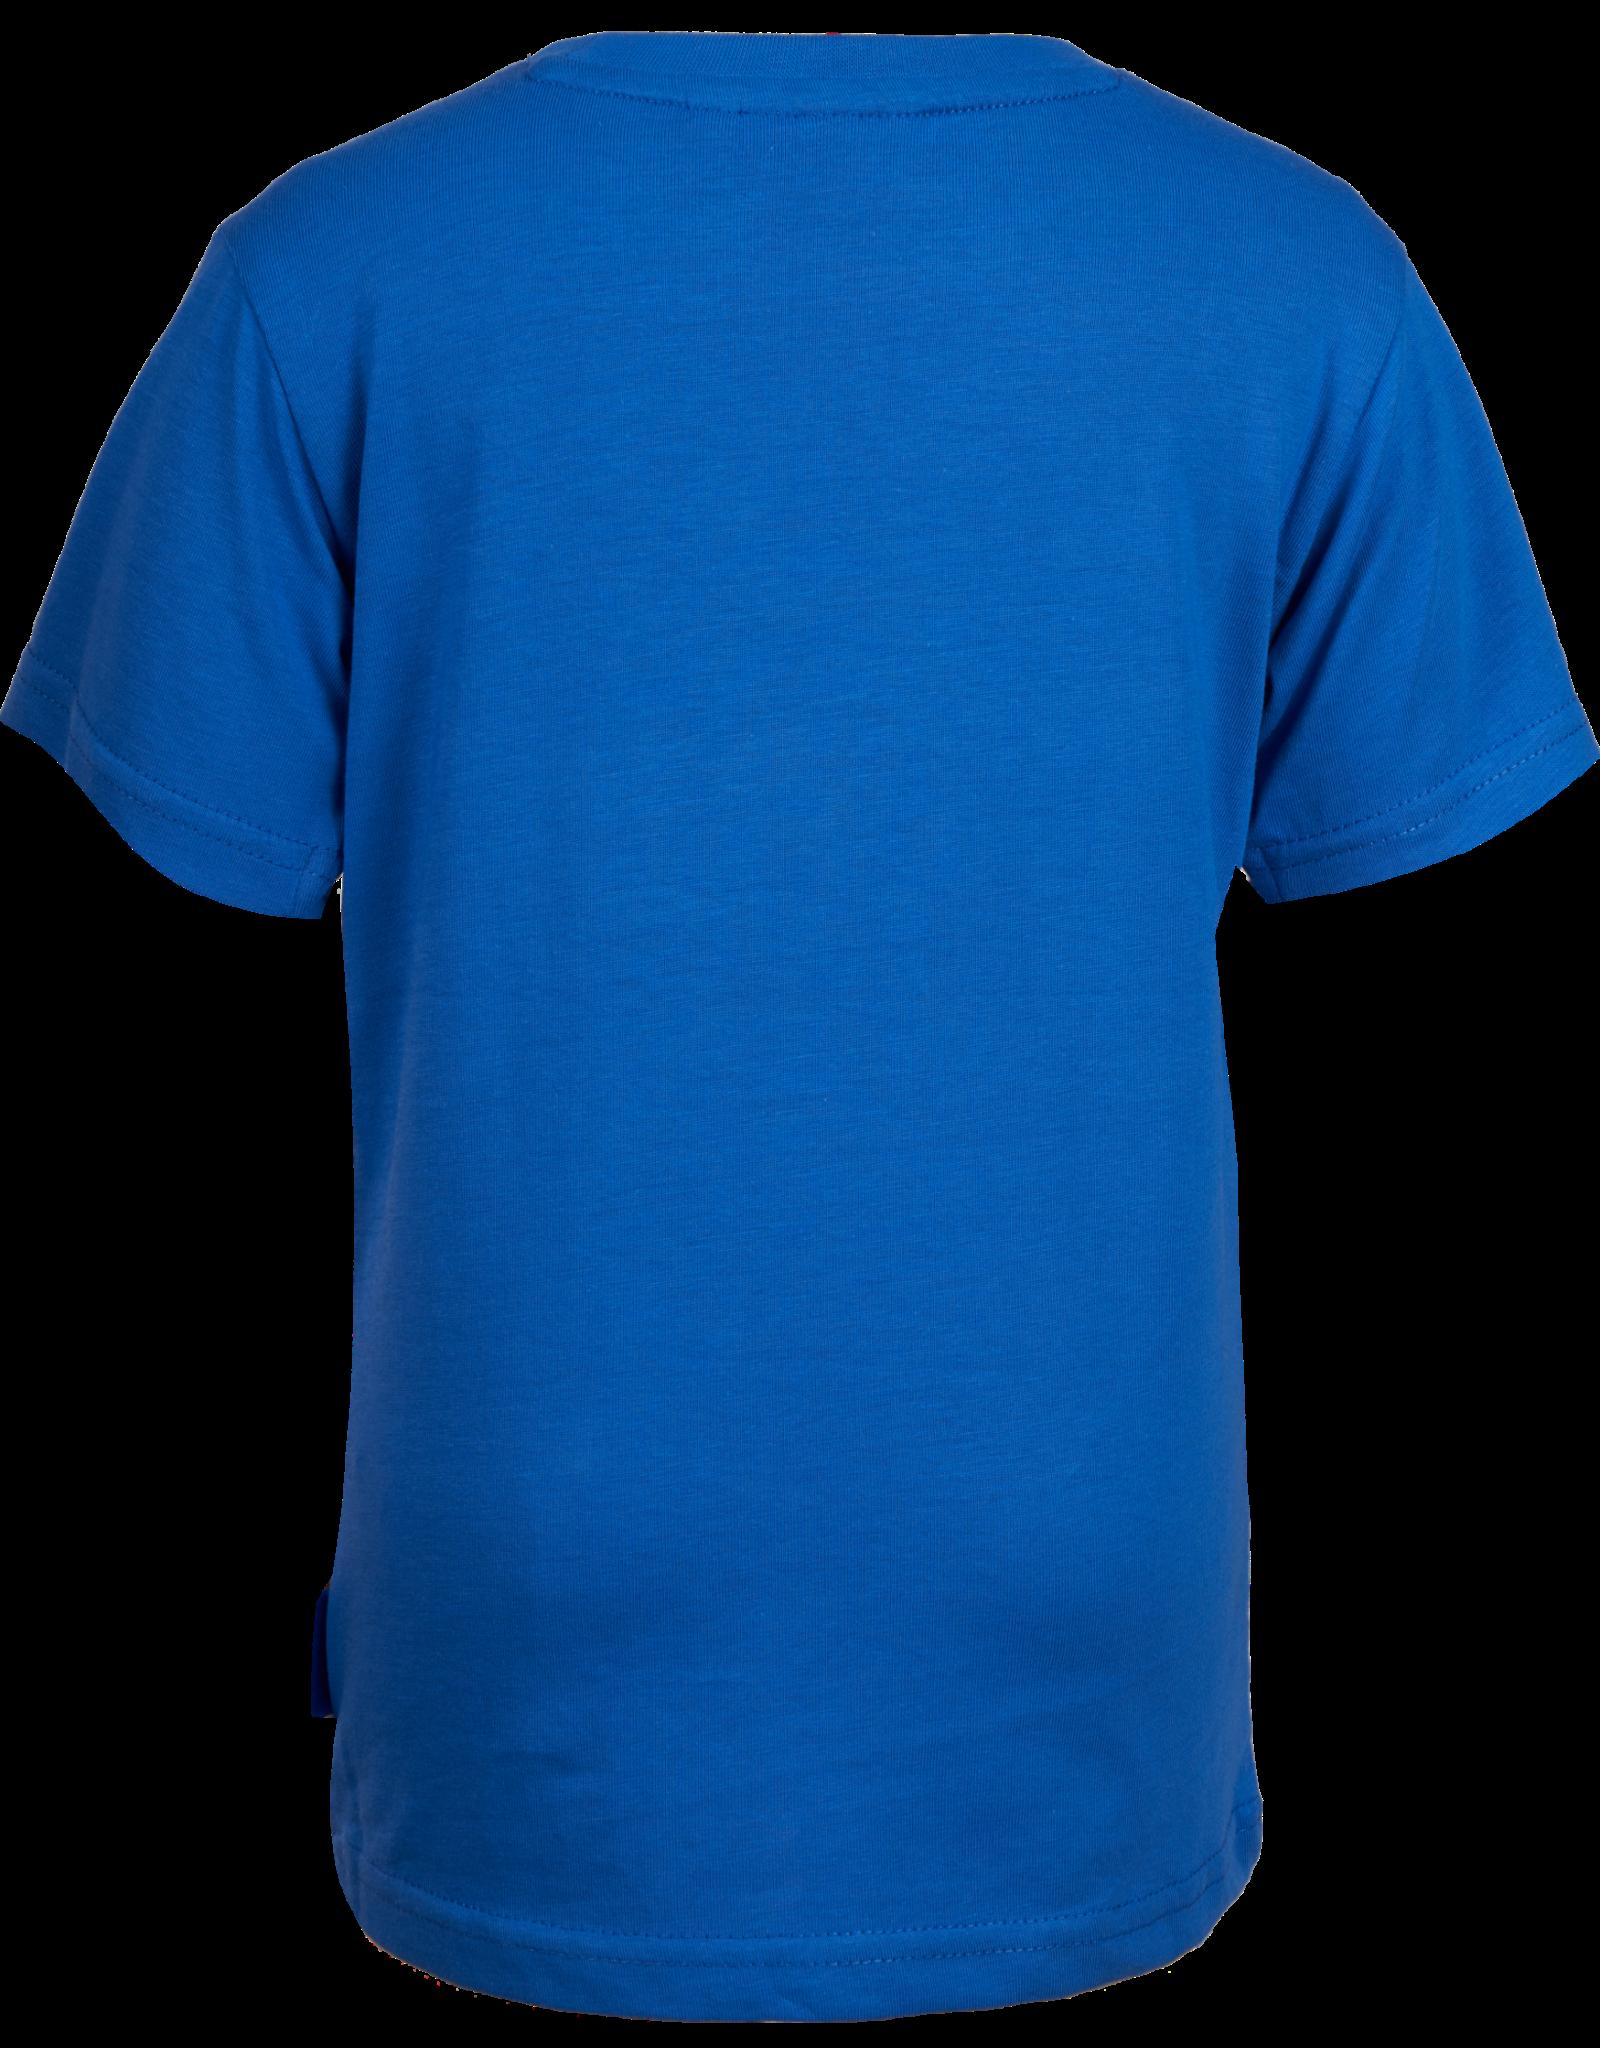 Someone JEEP-SB-02-C Blue